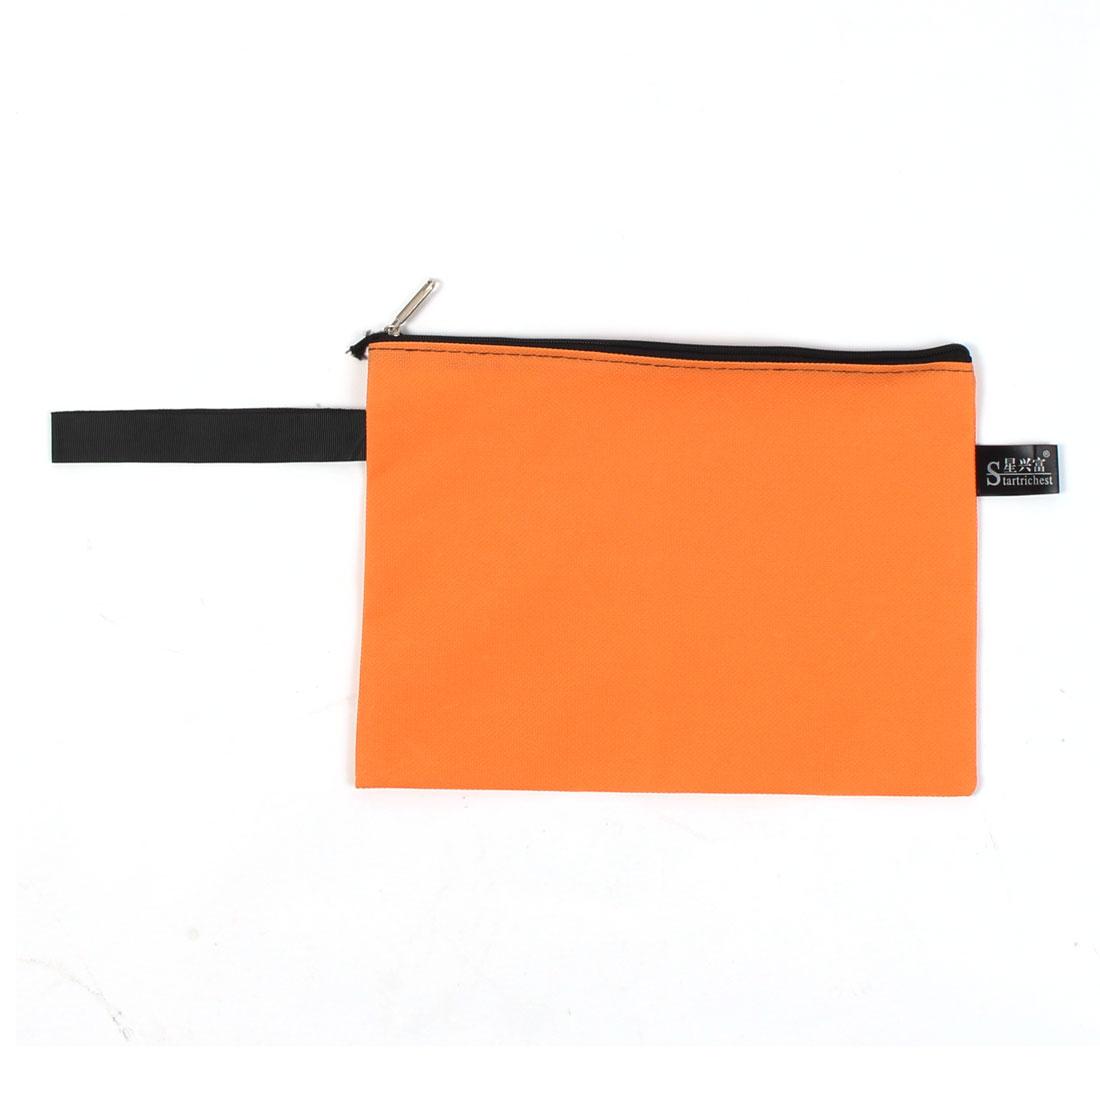 Nylon A5 Paper Pens Eraser CD Files Document Zipper Closure Bags Orange